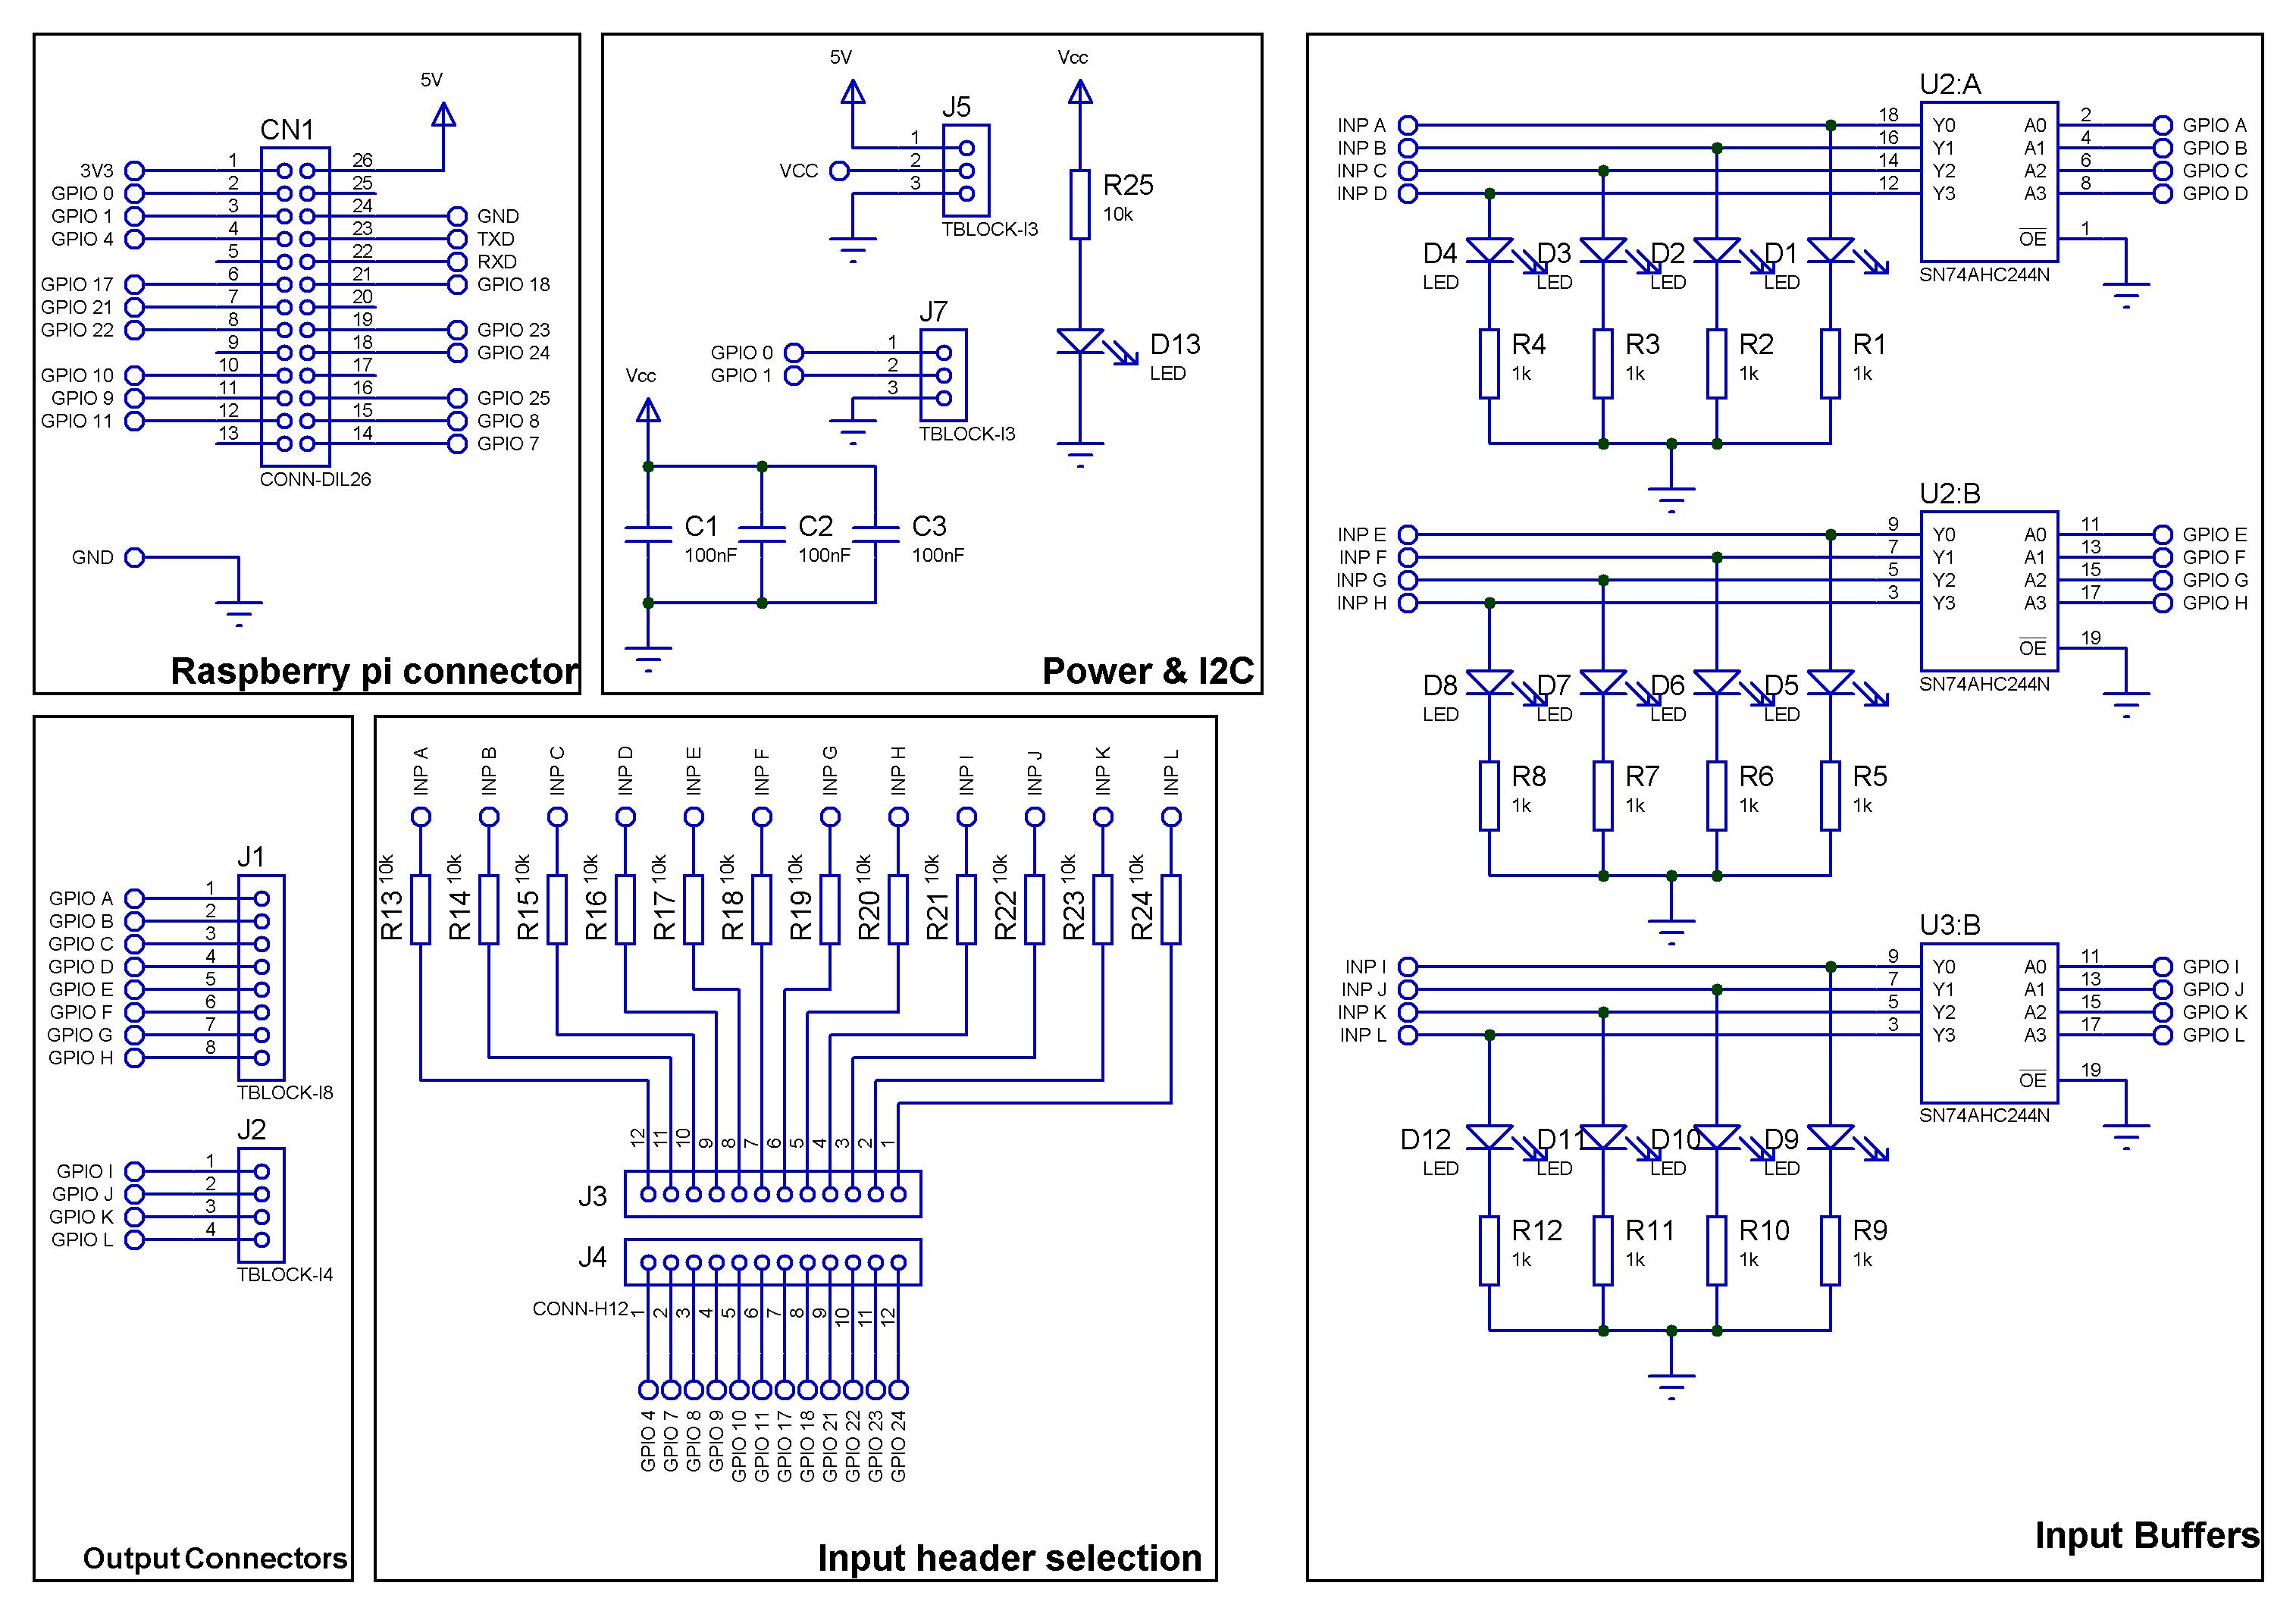 single-board computer, scr dimmer schematic, beagle board, orange pi schematic, gpio pinout schematic, xbox 360 schematic, scr motor control schematic, computer schematic, bluetooth schematic, bbc micro, ipad schematic, acorn archimedes, zx spectrum, usb schematic, acorn computers, banana pi schematic, raspberry pi foundation, lcd schematic, atmega328 schematic, rs232 isolator schematic, on raspberry pi schematic